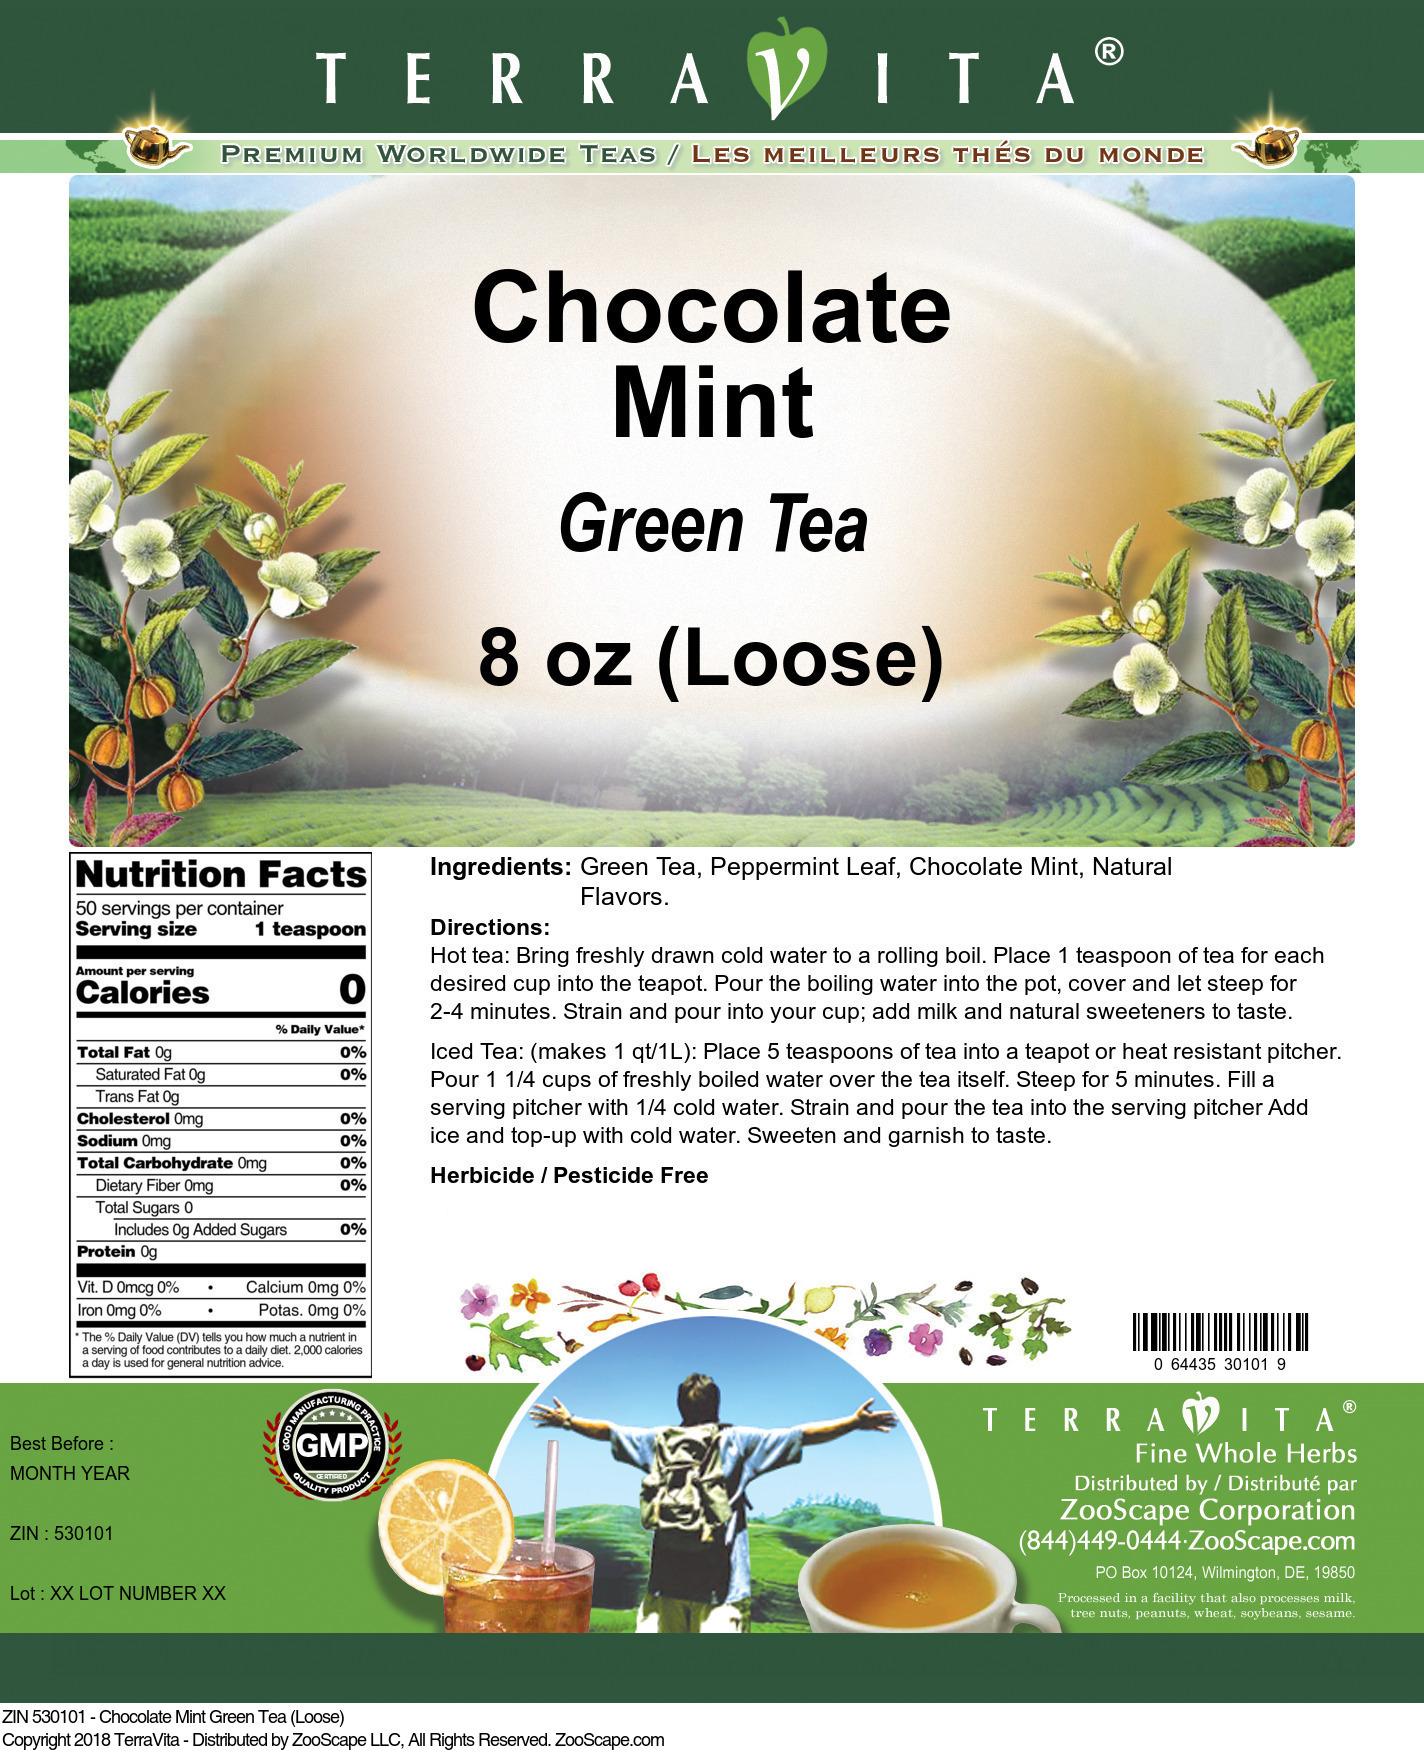 Chocolate Mint Green Tea